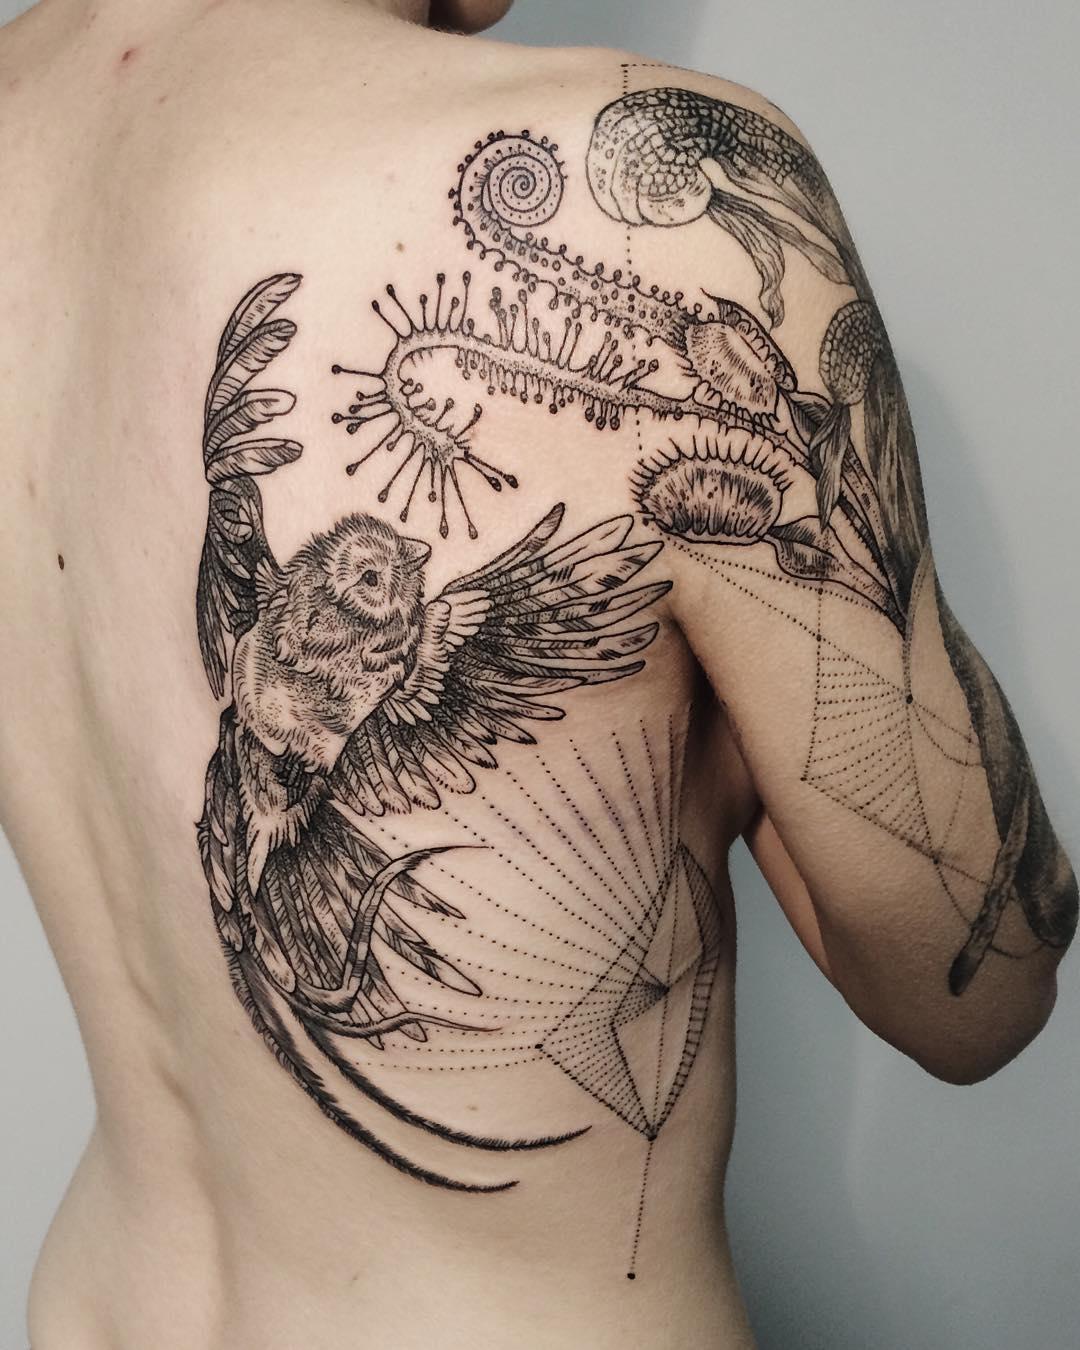 naturalistic-tattoos-vintage-pony-reinhardt-7